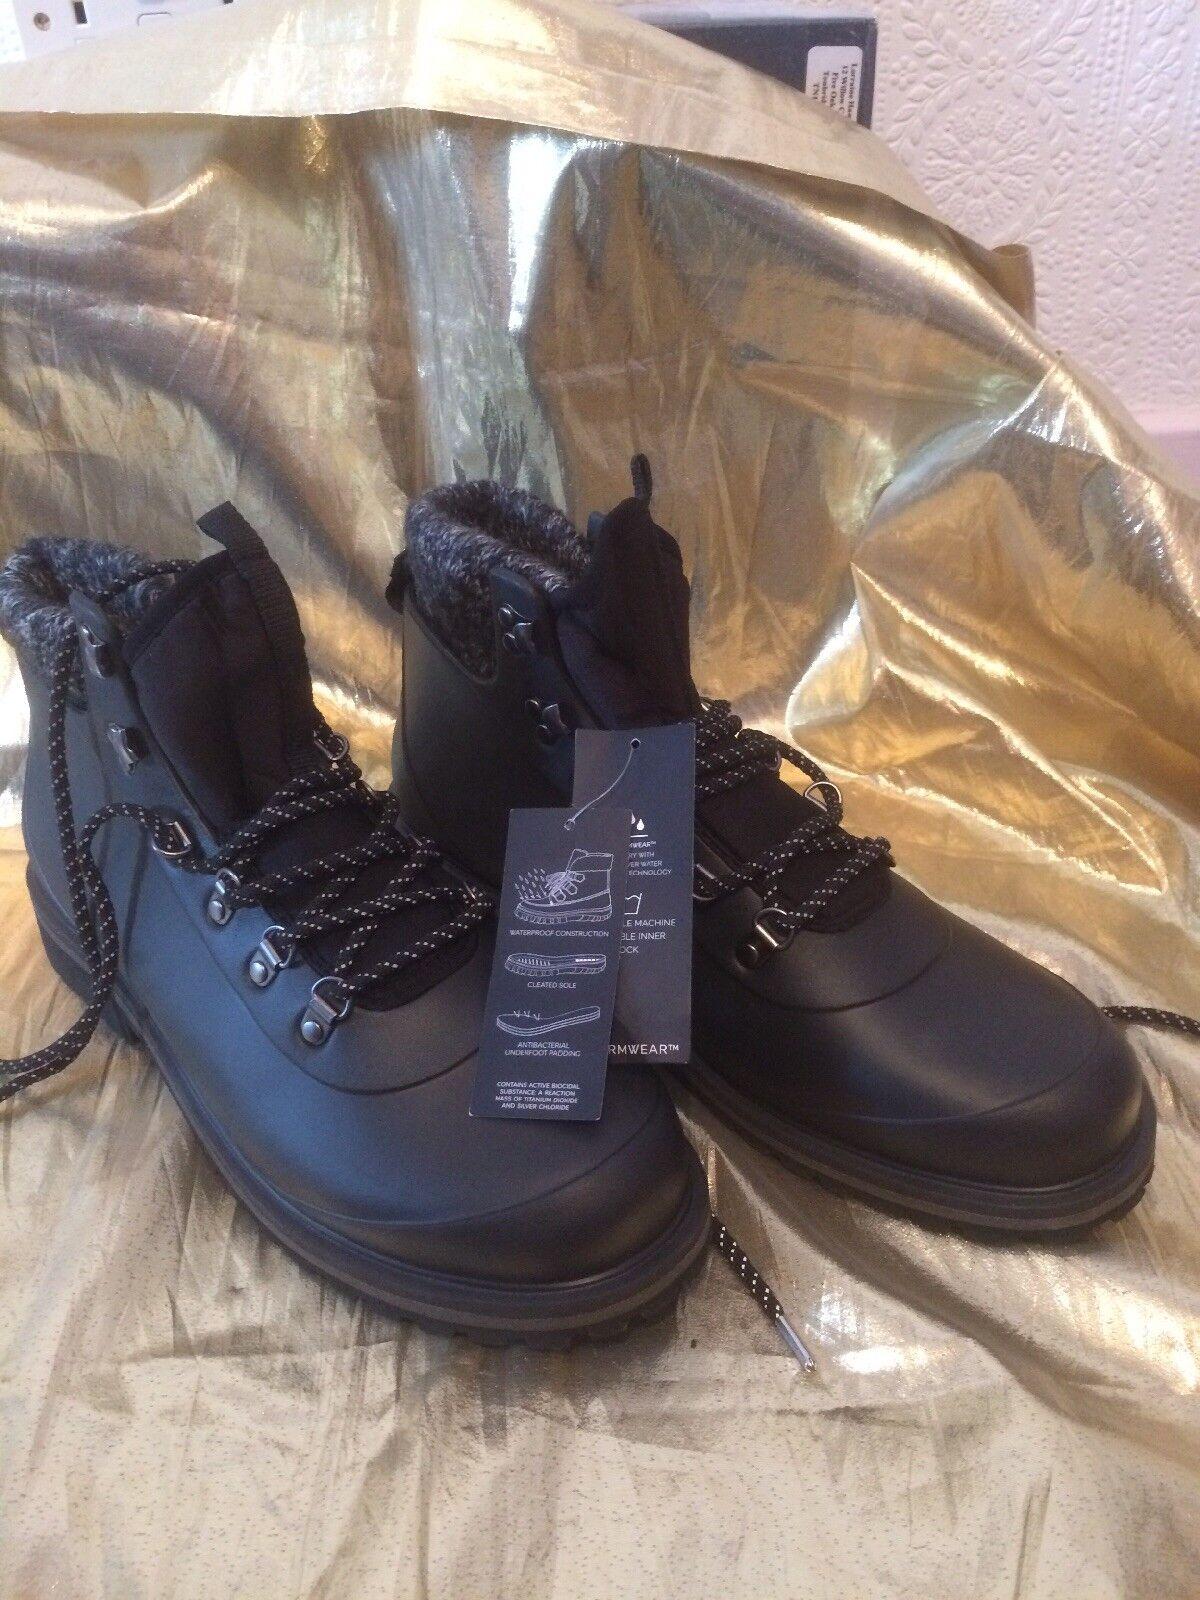 Marks & Impermeabili Spencer Stivali collezione Stormwear Stivali Spencer ... 8793ab